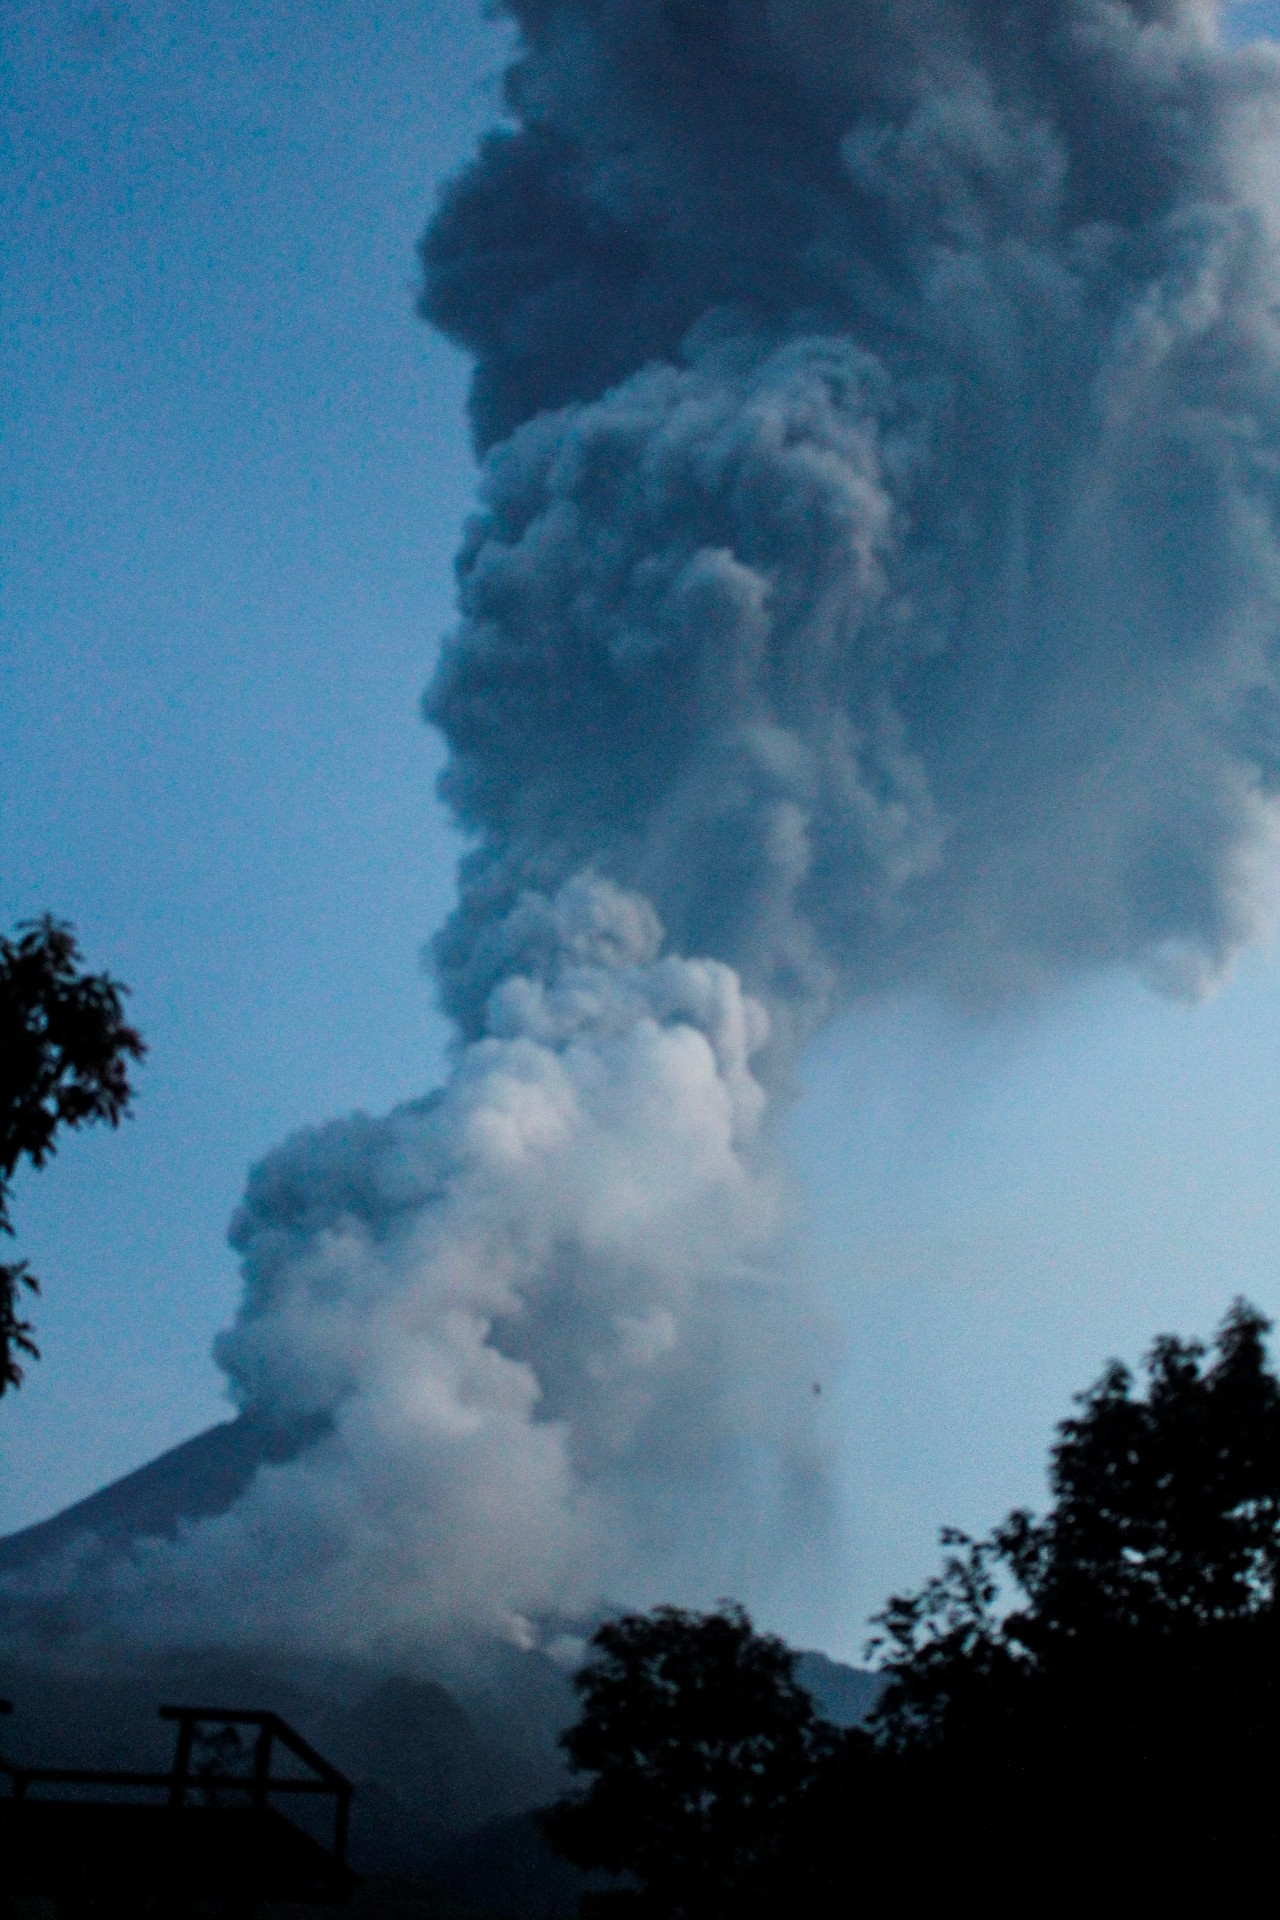 Volcán Merapi, en Indonesia, entra en erupción